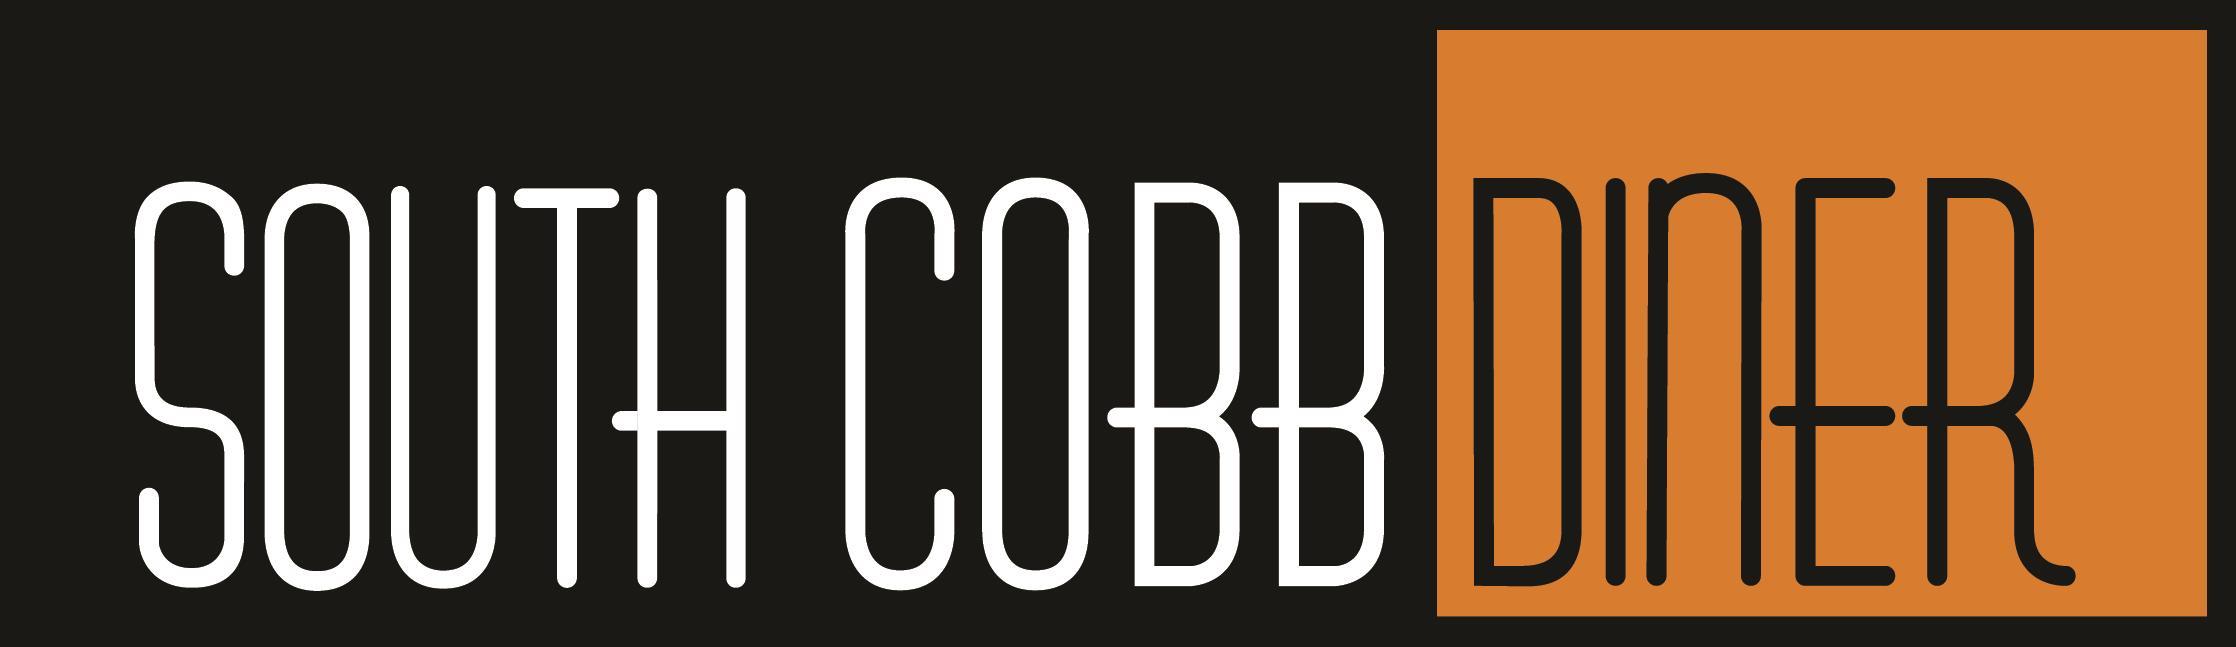 South Cobb Diner